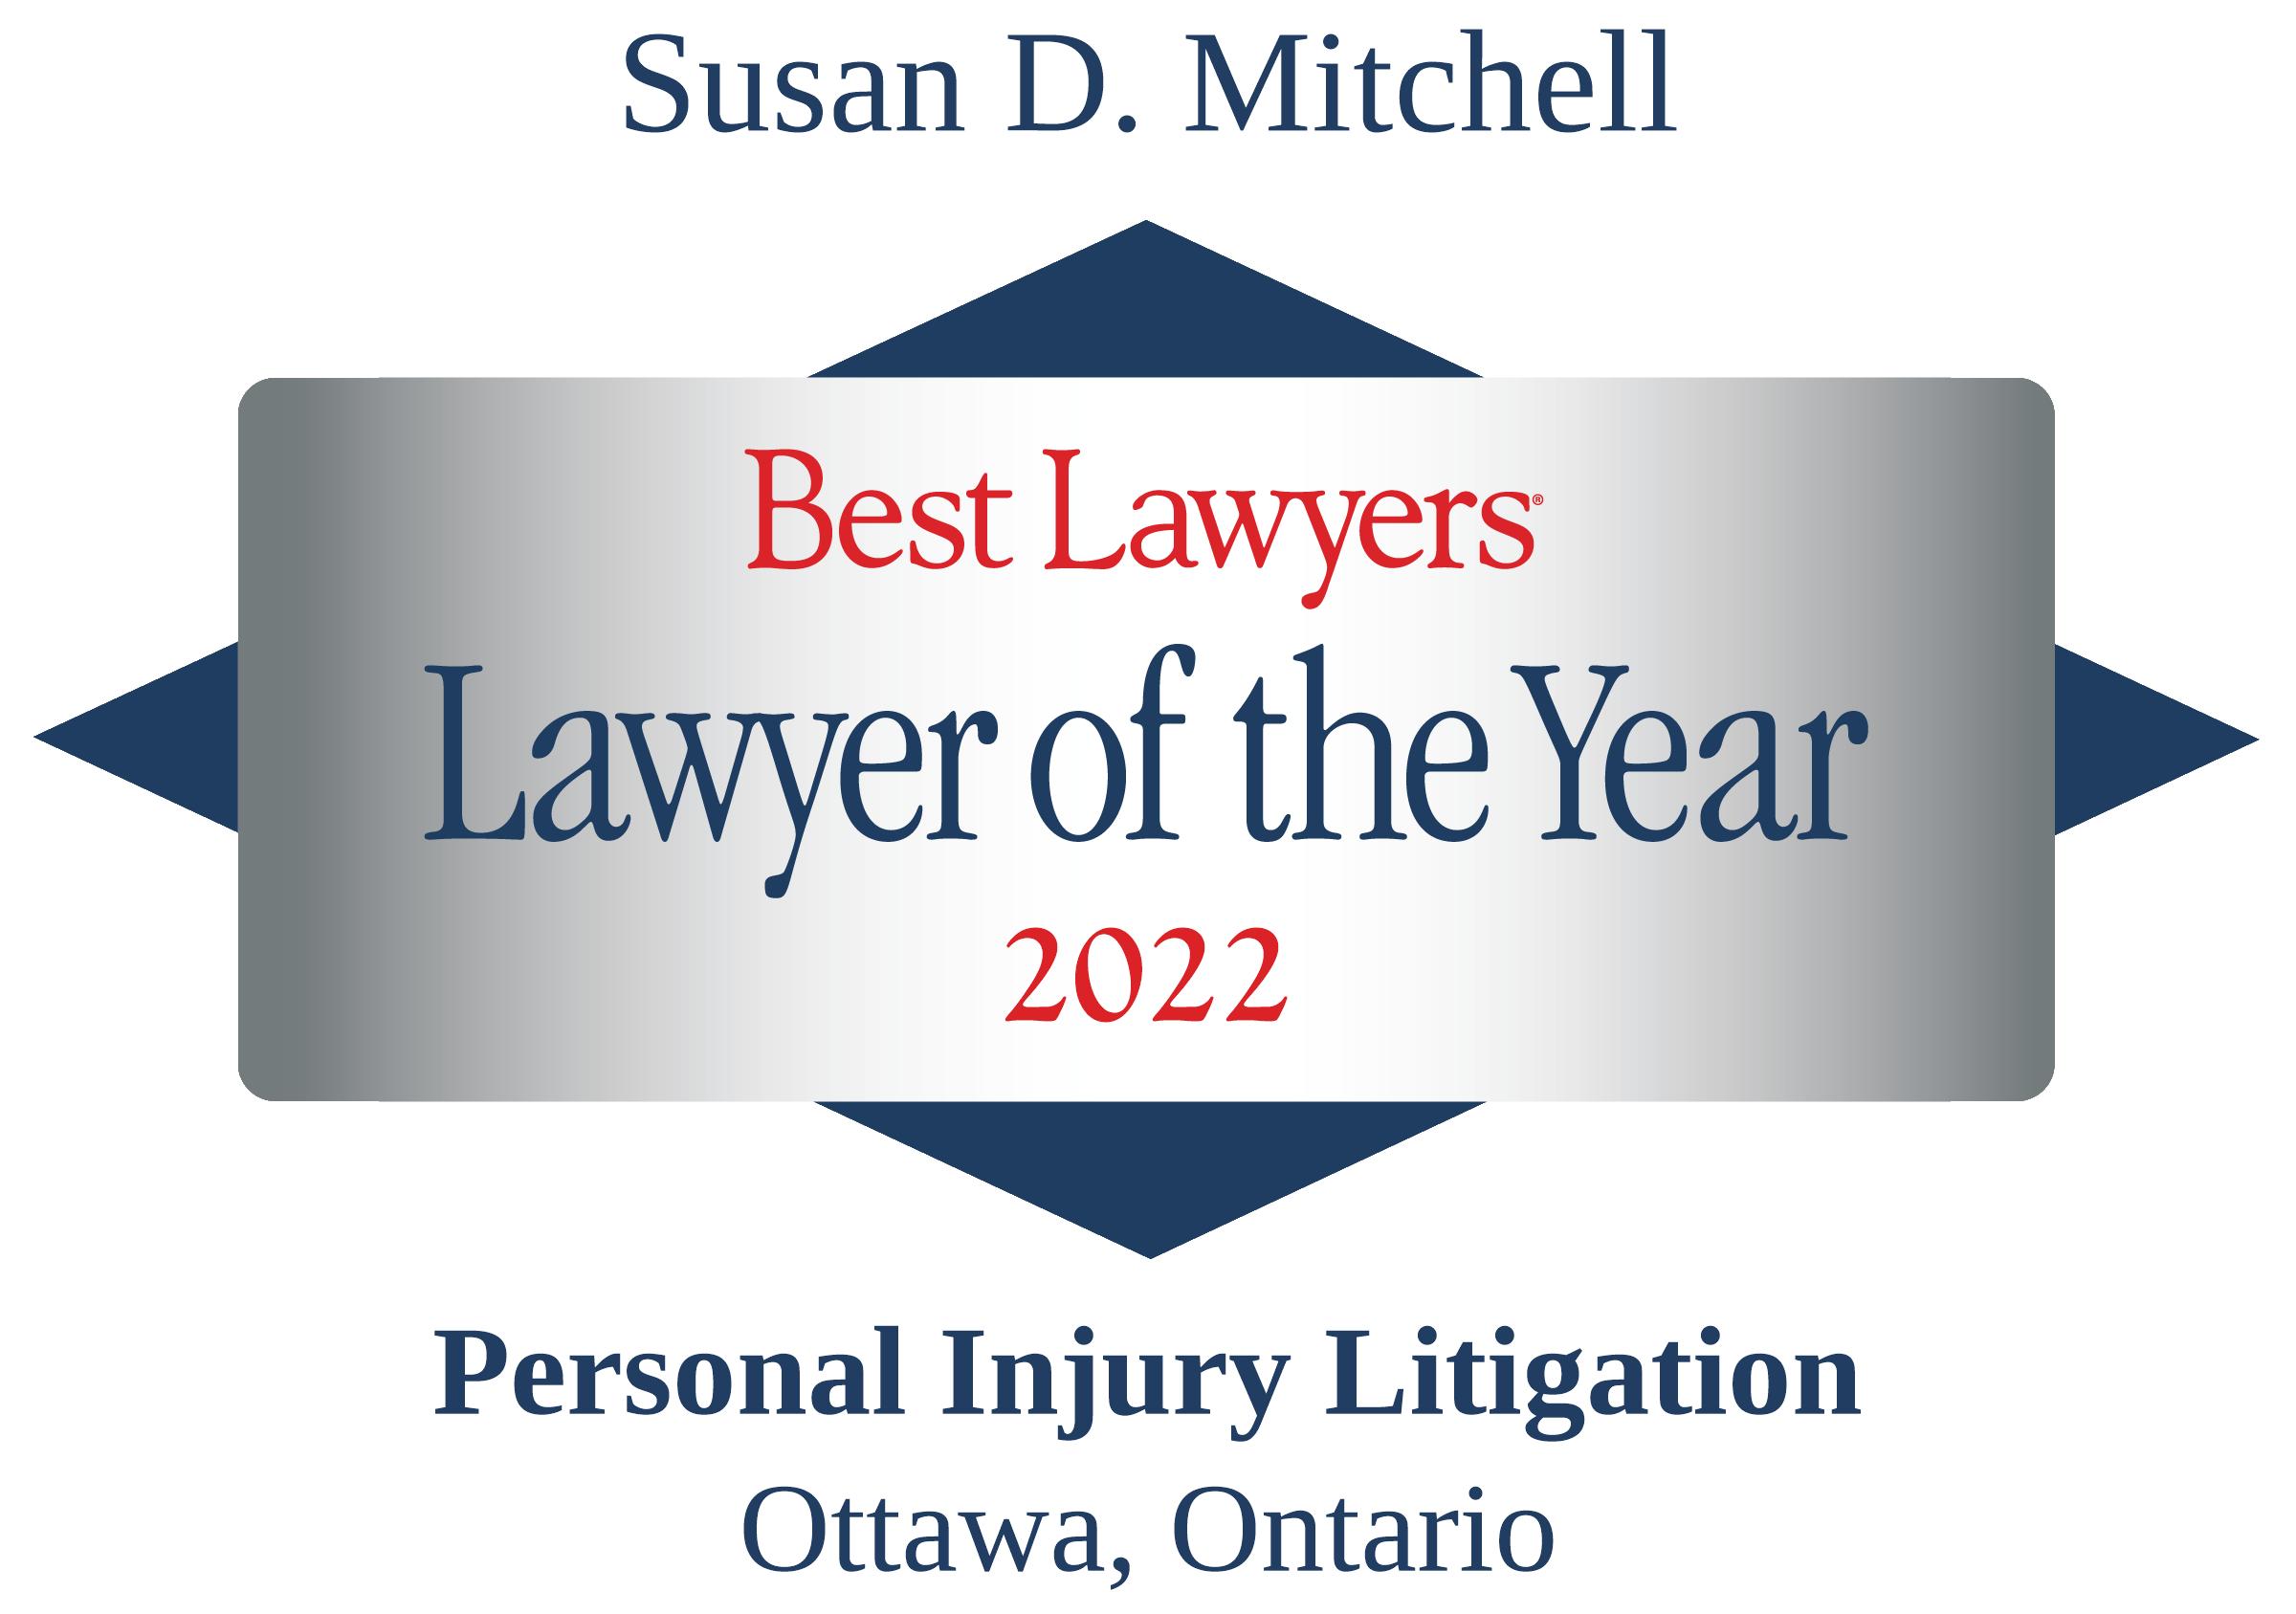 Best Lawyers - Susan D. Mitchell